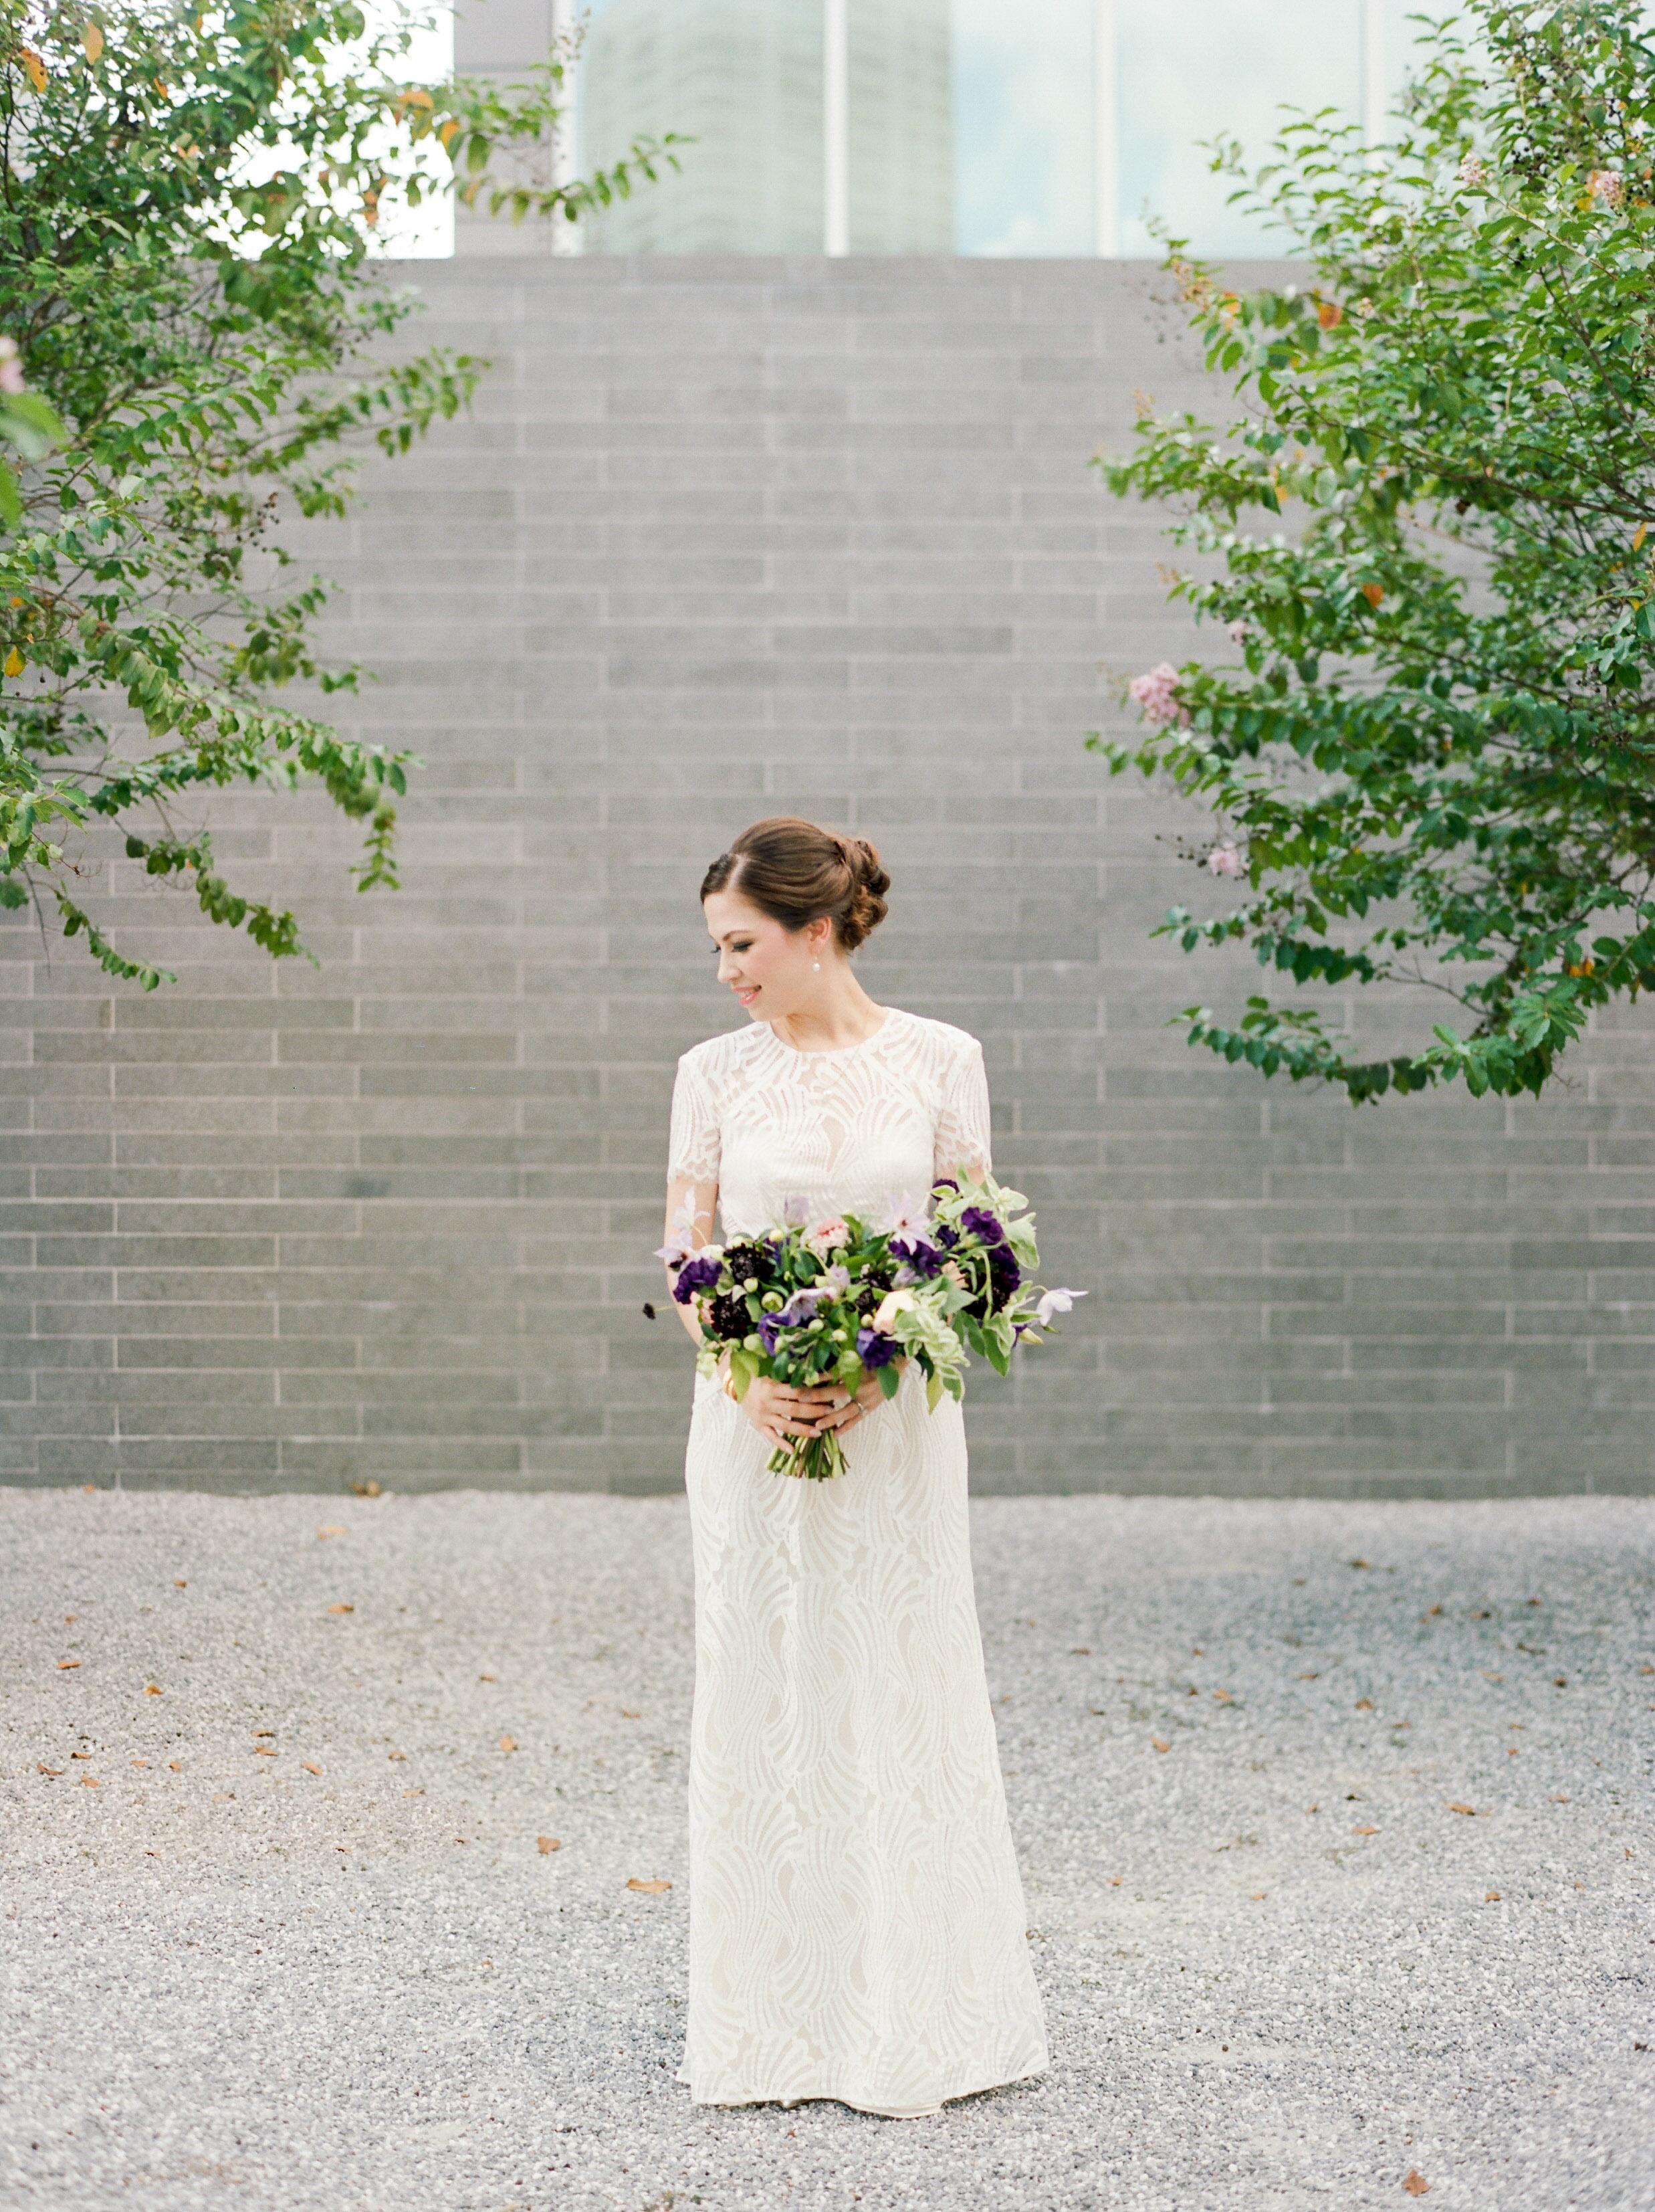 mcgovern-centennial-gardens-wedding-houston-wedding-photographer-bridals-film-austin-wedding-photographer-9.jpg